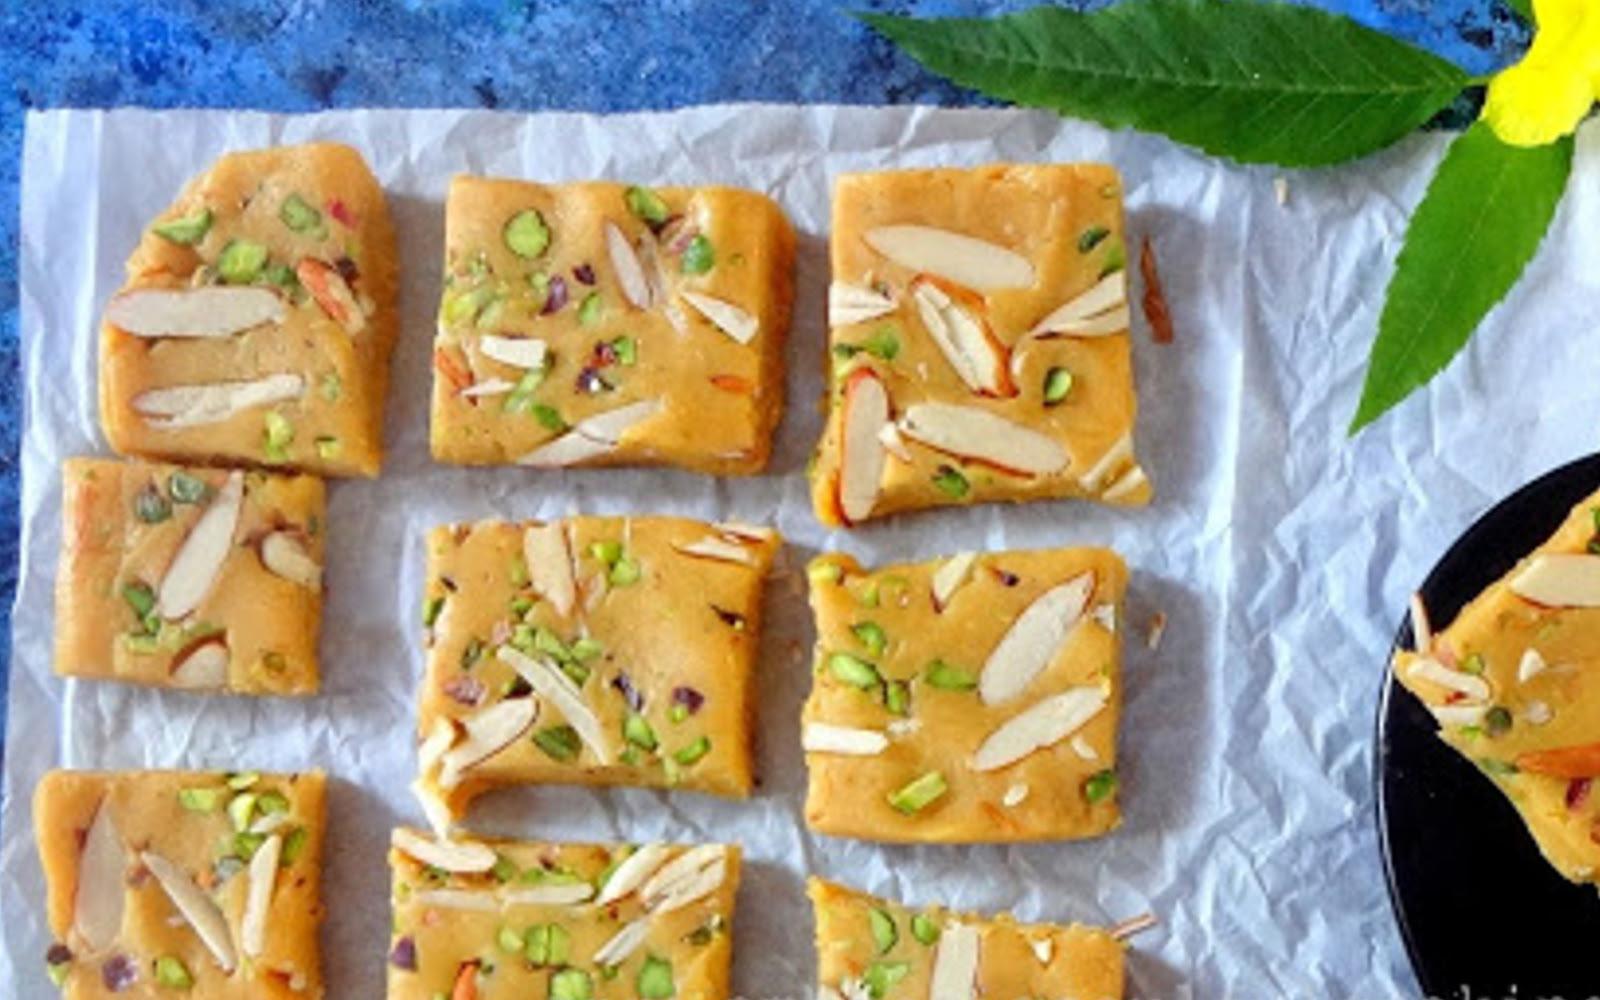 Besan Barfi (Chickpea Flour Fudge)